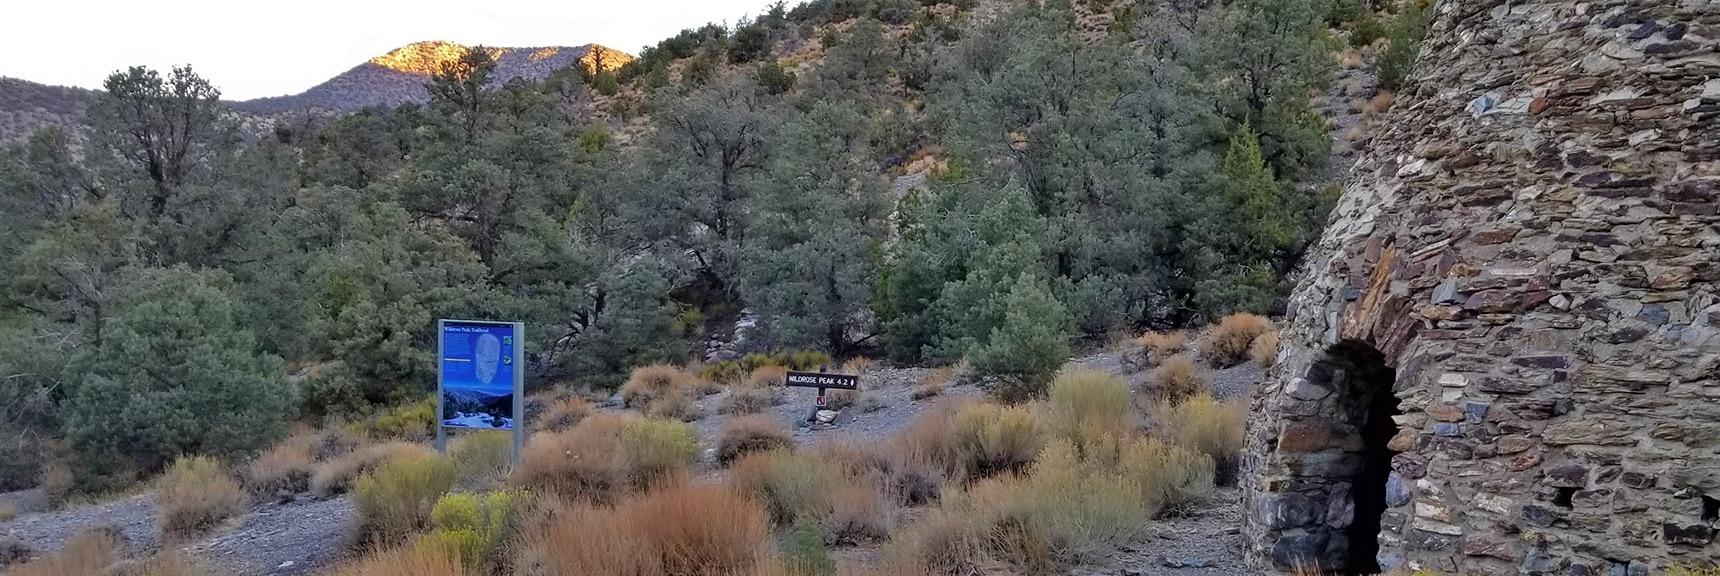 Wildrose Peak Trailhead at Left End of Wildrose Charcoal Kilns   Wildrose Peak   Panamint Mountain Range   Death Valley National Park, California